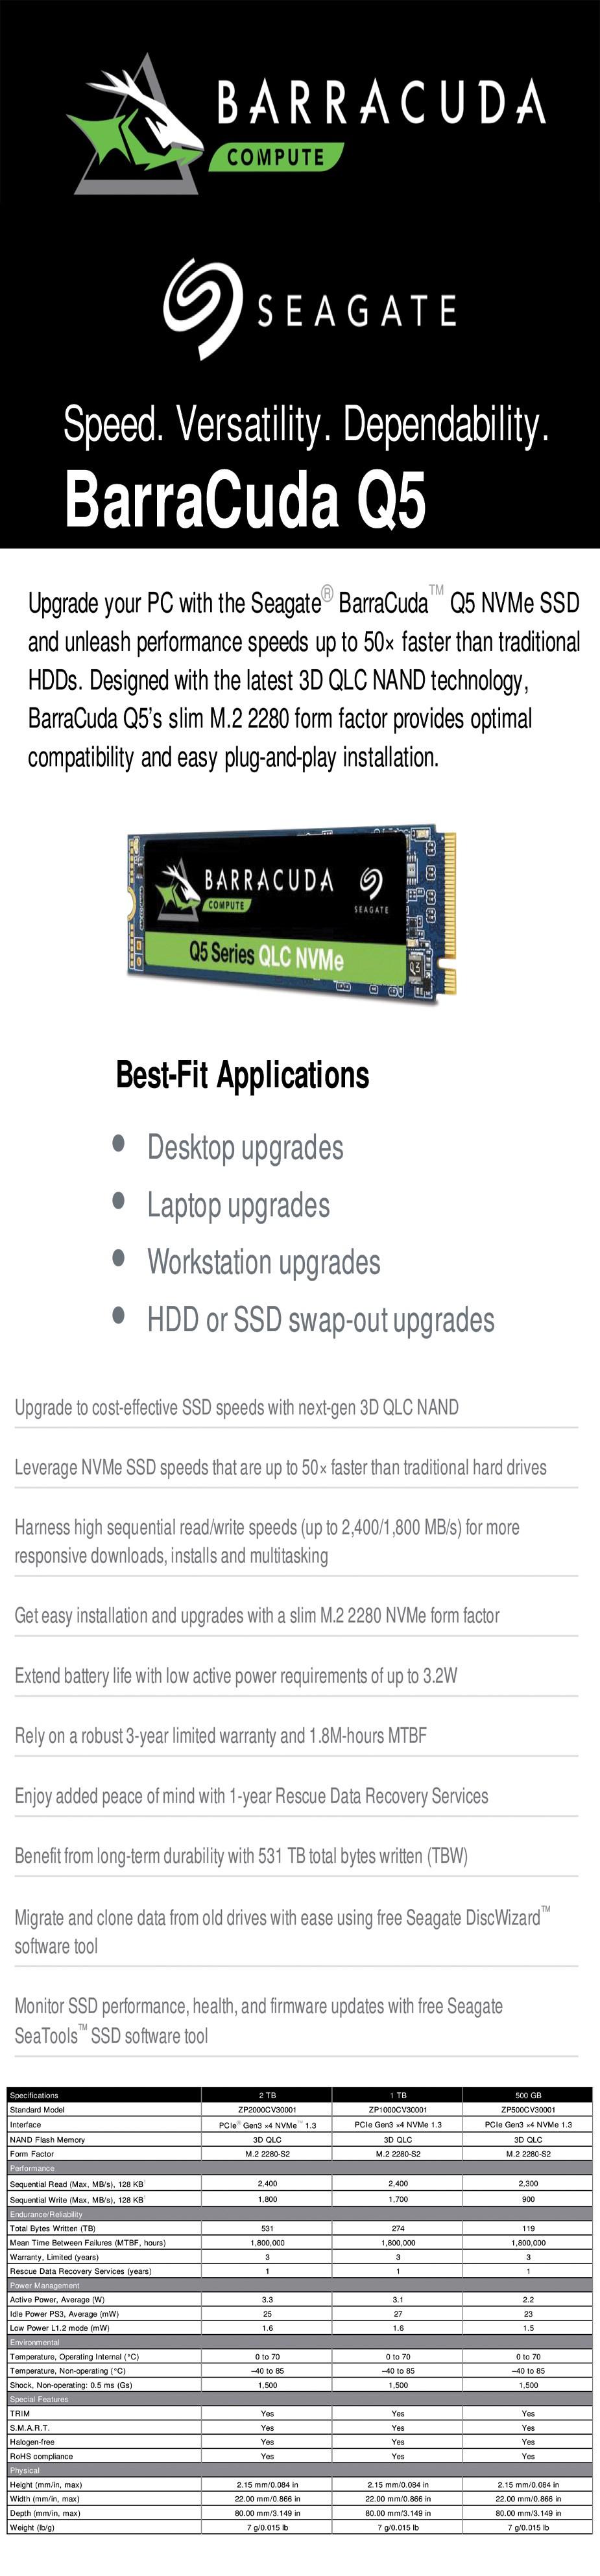 Seagate BarraCuda Q5 1TB NVMe M.2 QLC NAND SSD - ZP1000CV3A001 - Overview 1